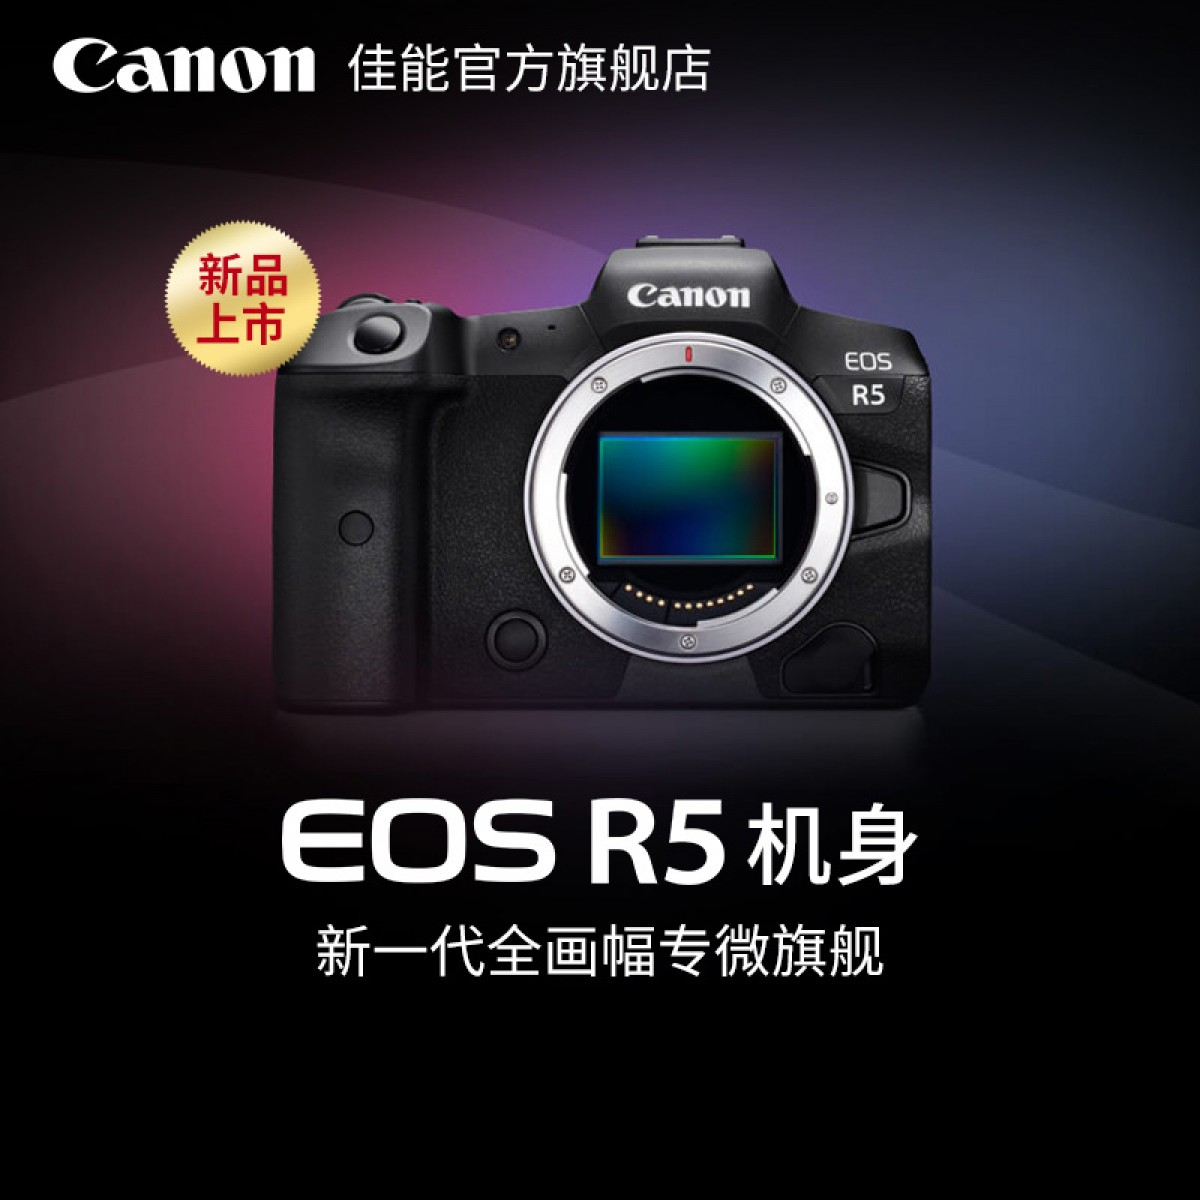 Canon/佳能 EOS R5 单机身 24-105套机 全画幅专业级微单相机专微